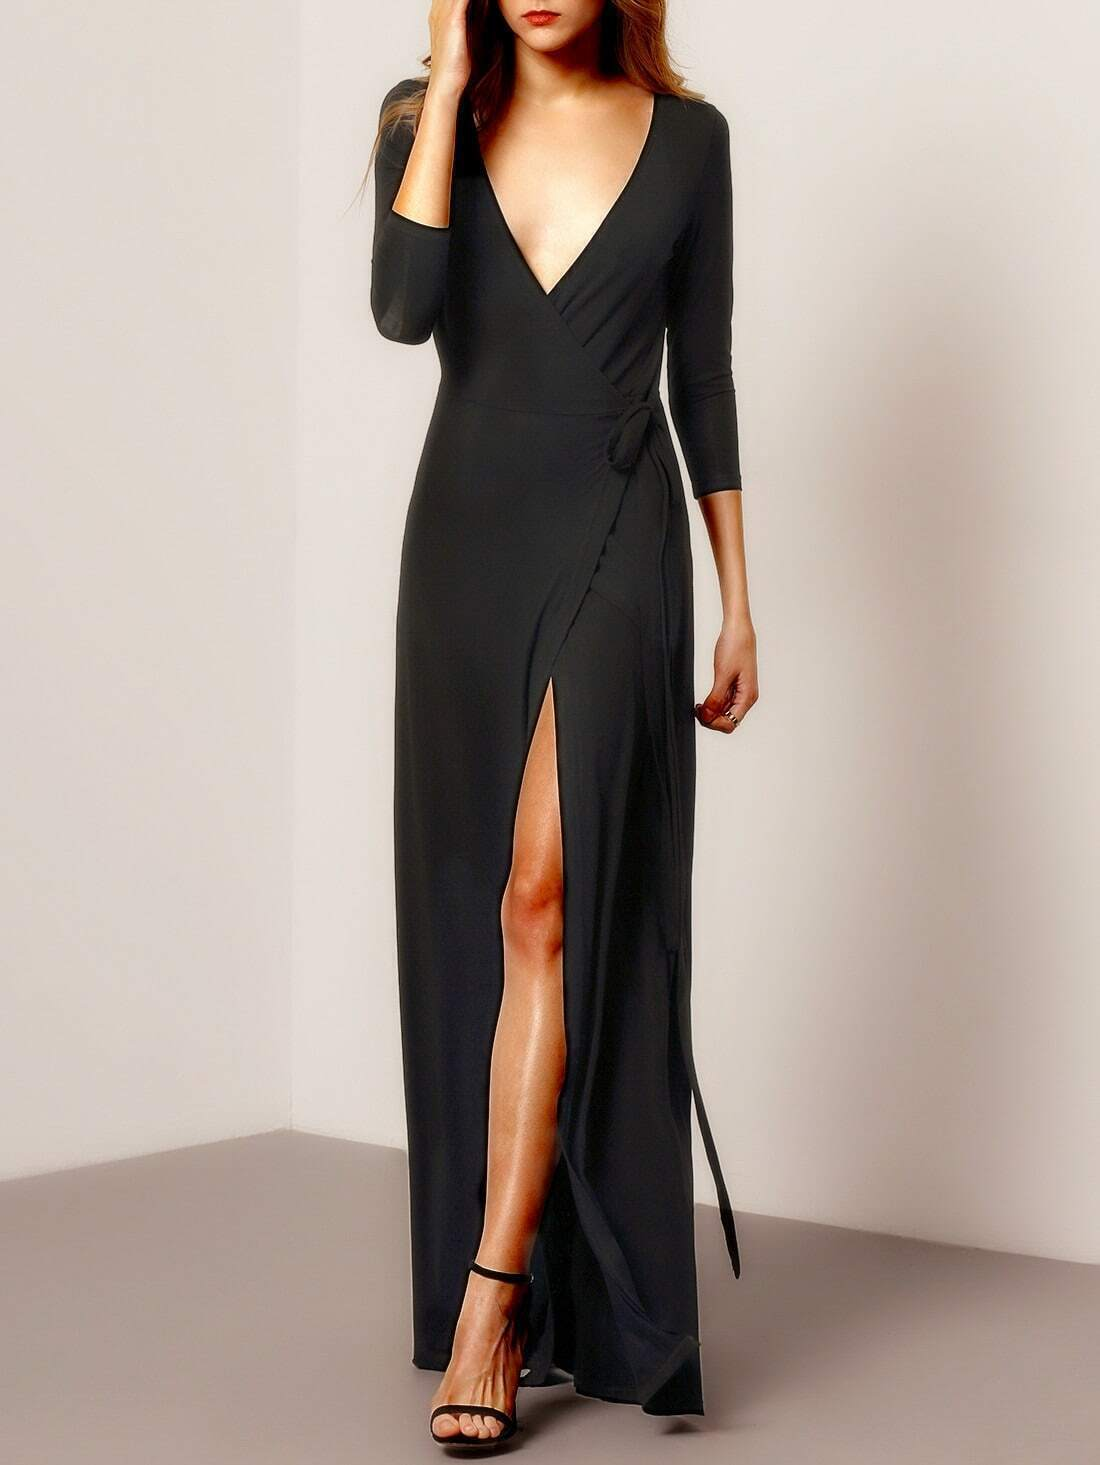 Black Deep V Neck Split Maxi Dress Emmacloth Women Fast Fashion Online